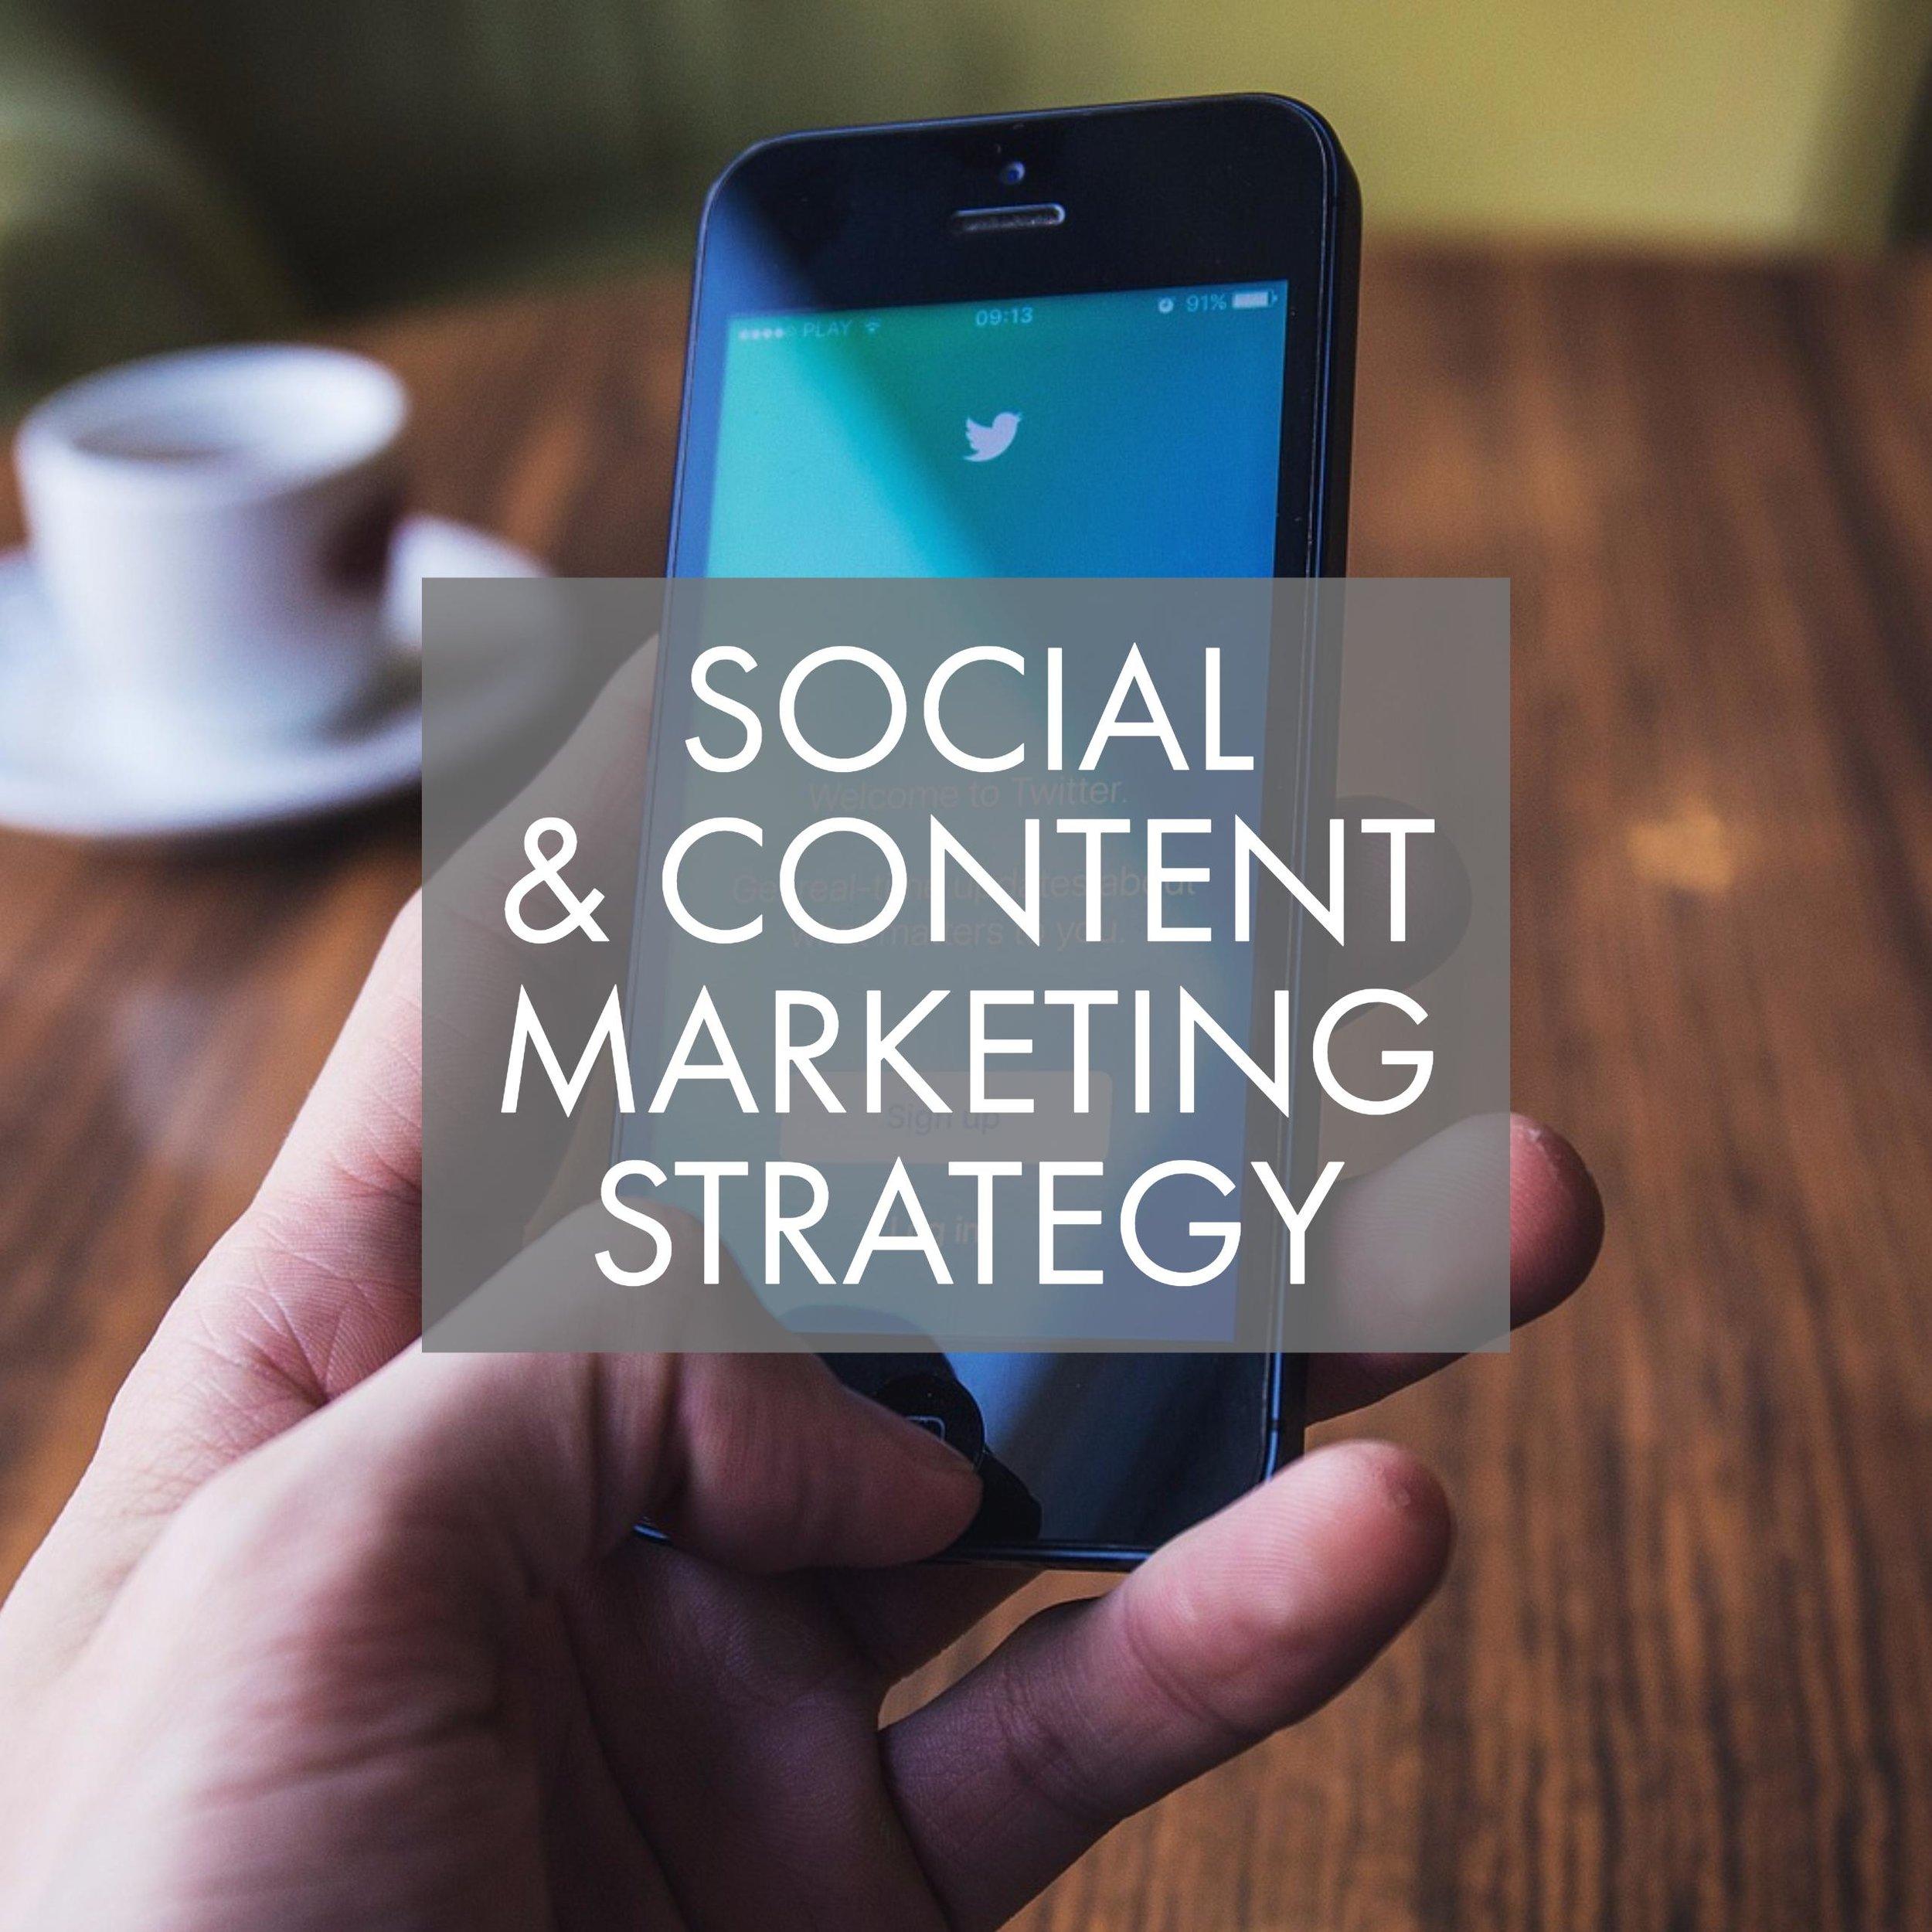 social-content-strategy-wolffsamans.jpg